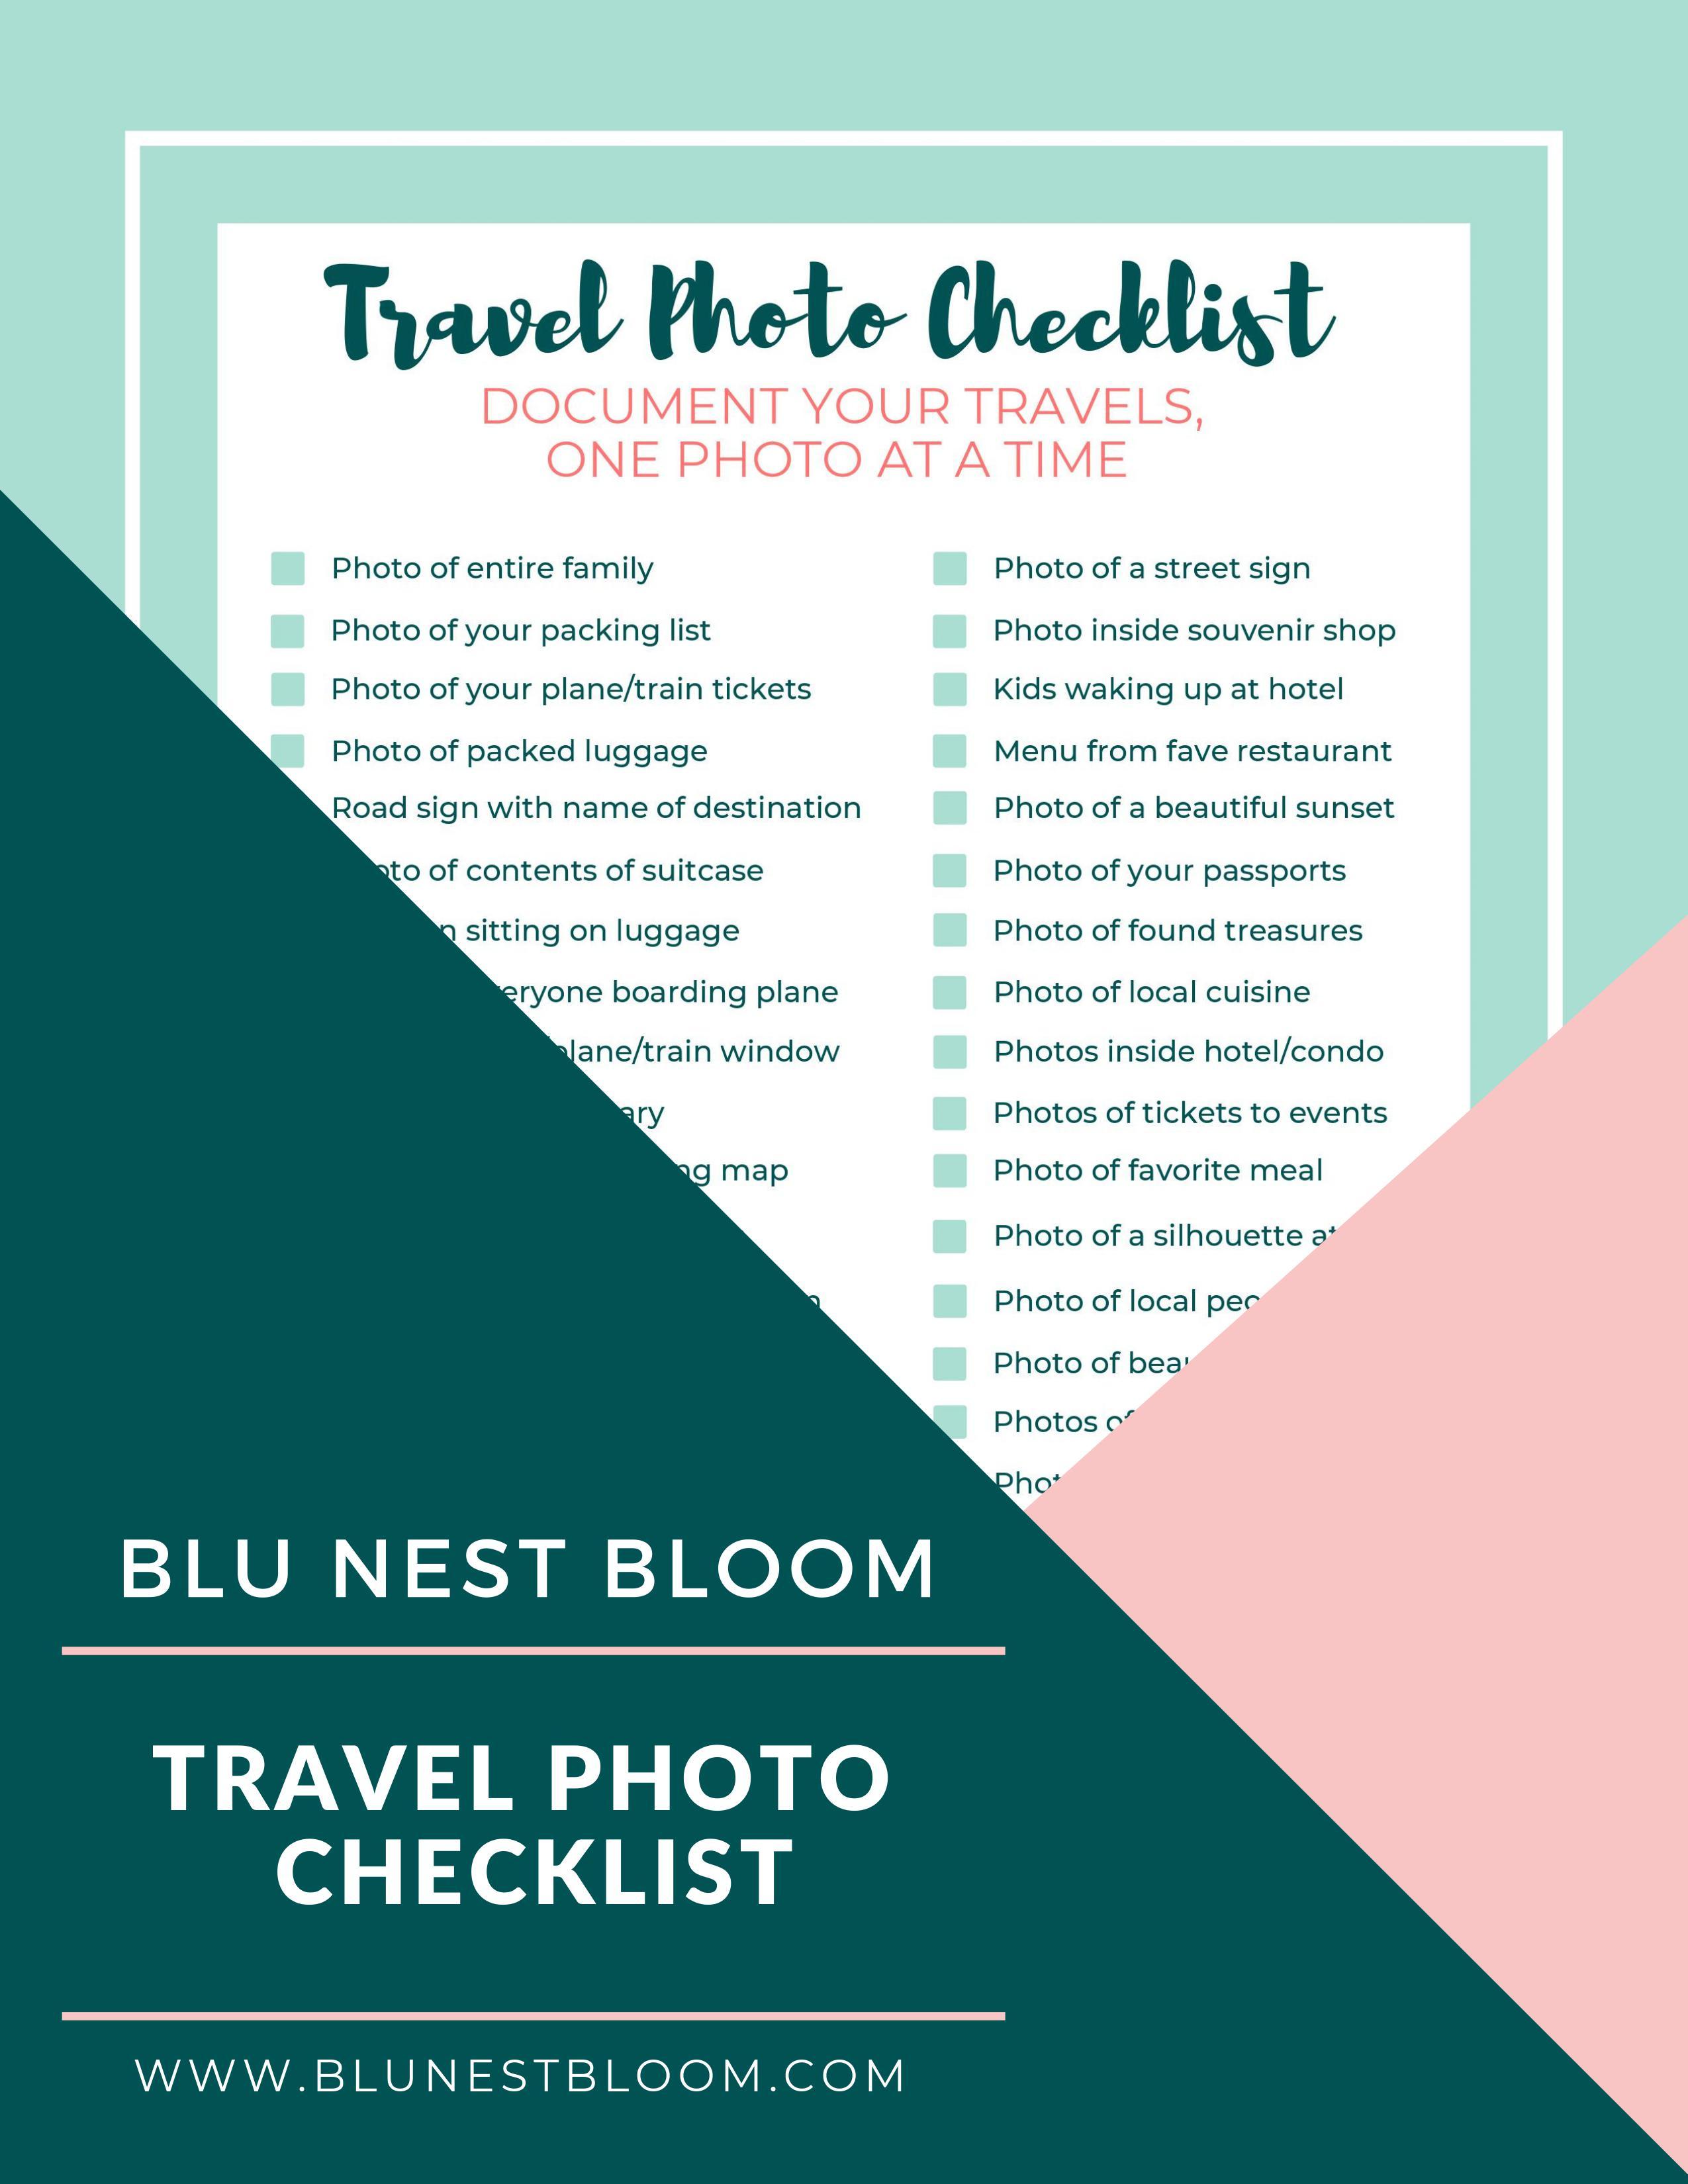 Travel Photo Checklist - Pinterest